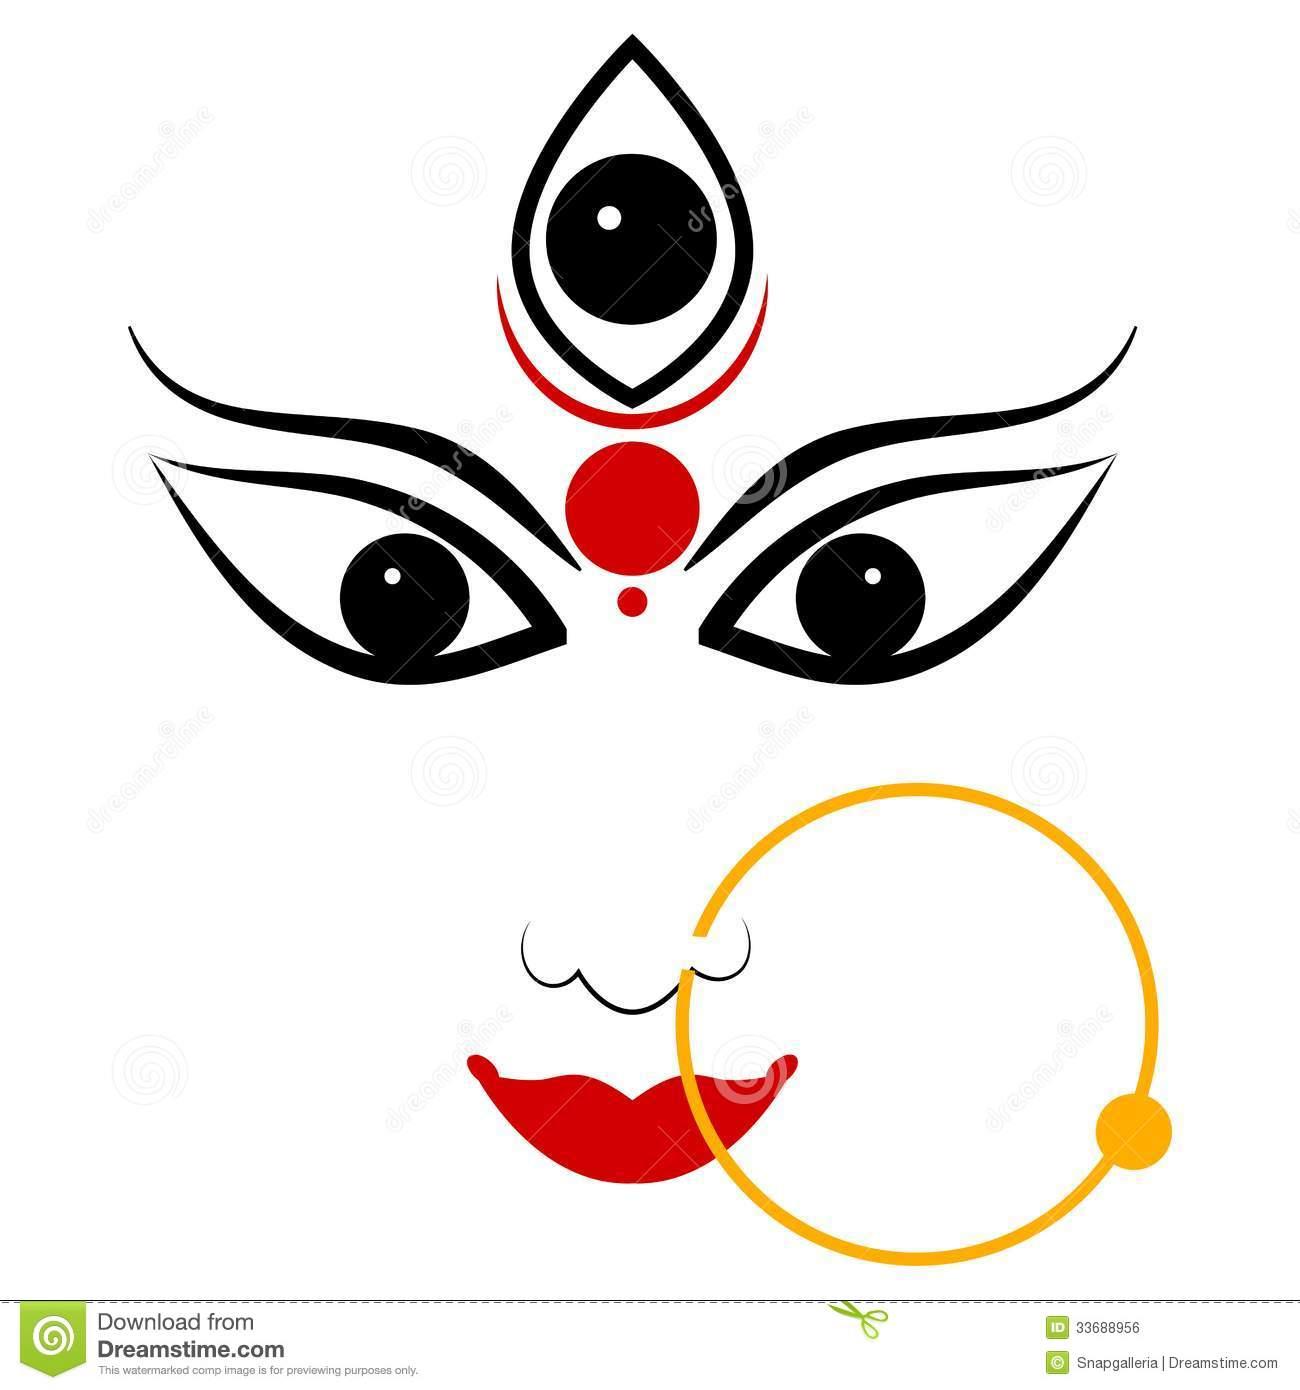 Goddess Durga. Easy to edit vector illus-Goddess Durga. Easy to edit vector illustration of Goddess Durga Royalty  Free Stock Image-9